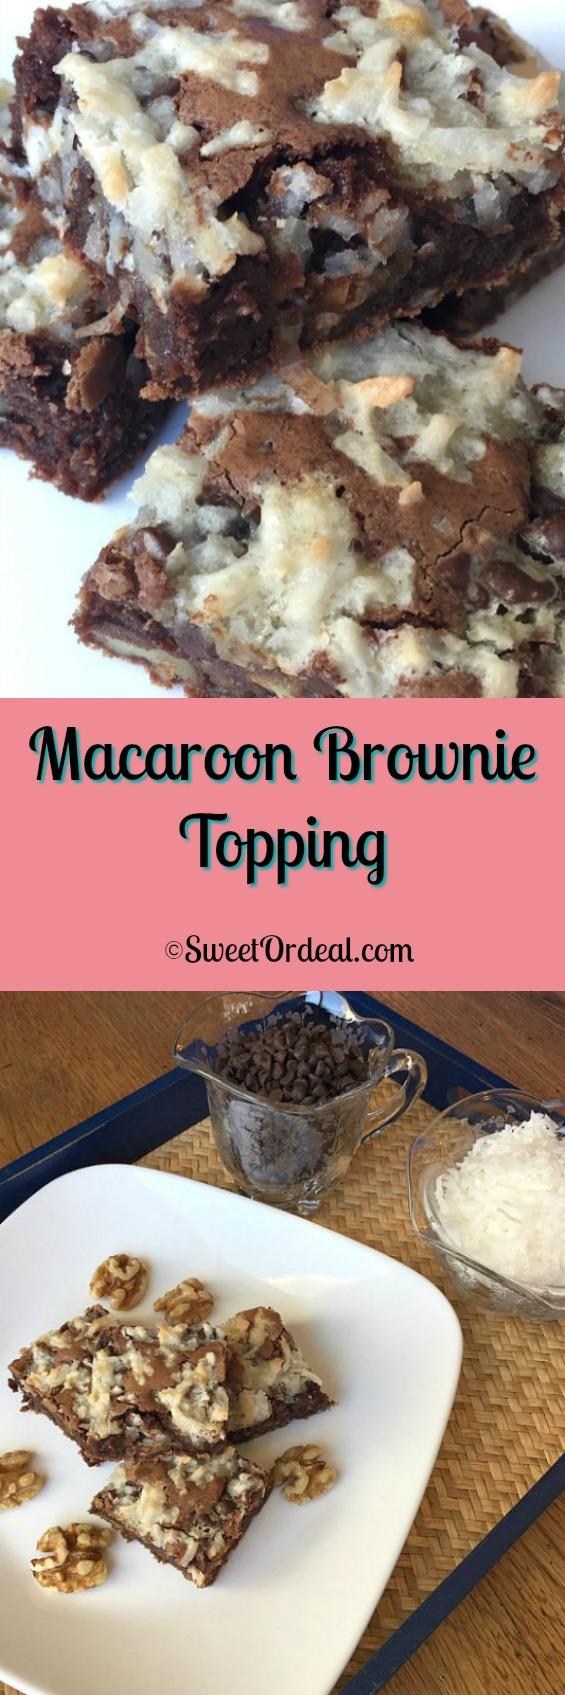 Macaroon Brownie Topping